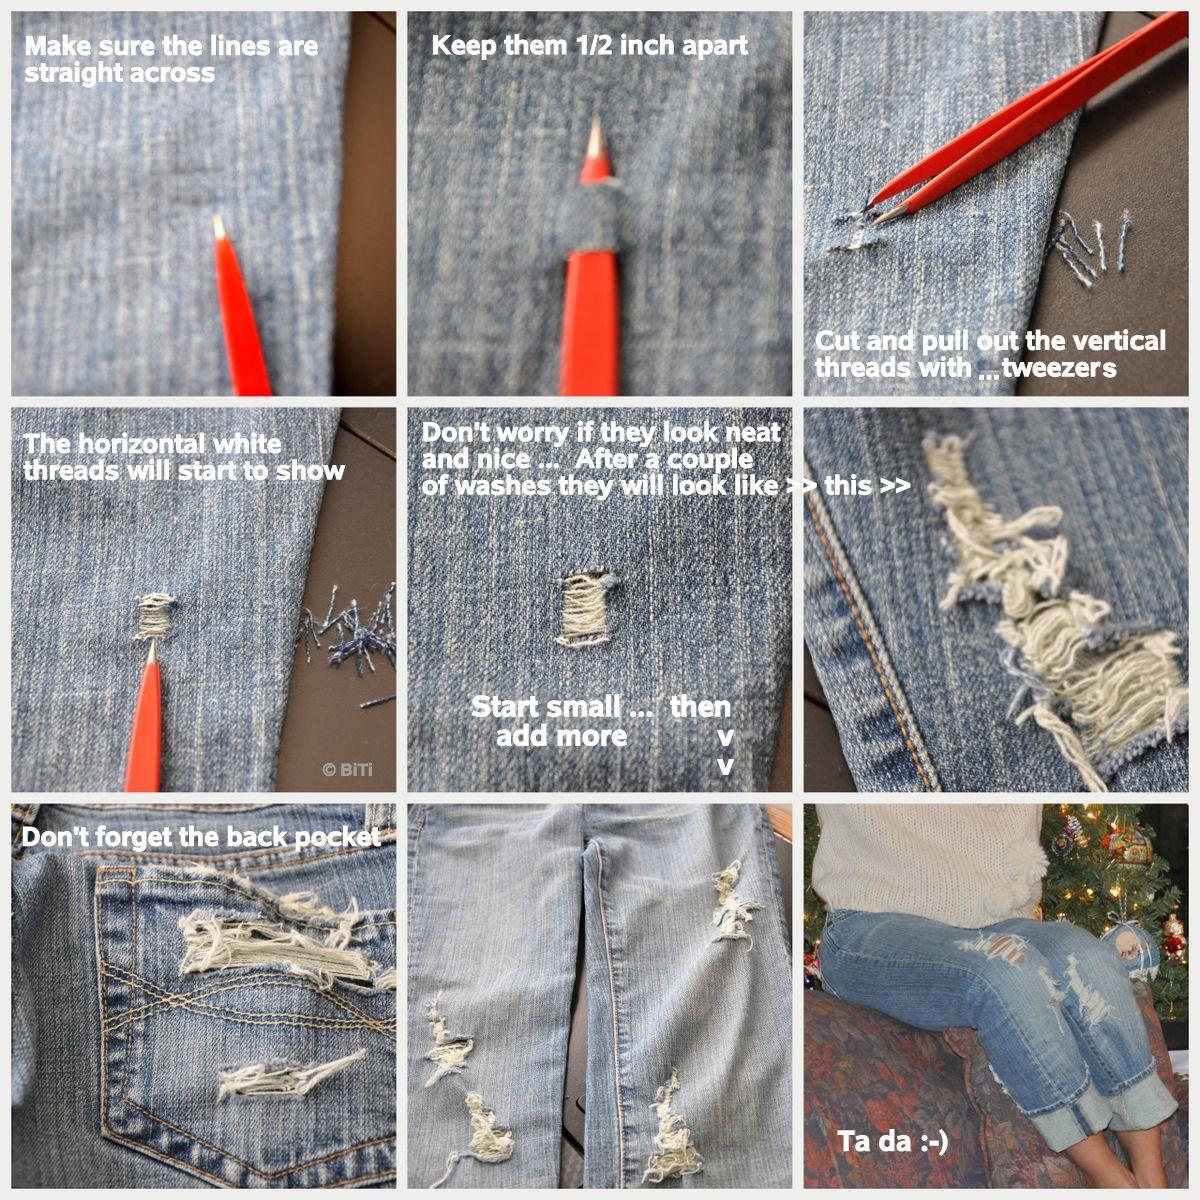 Pin by Kristen Stuller on Fashion | Diy ripped jeans, DIY ...